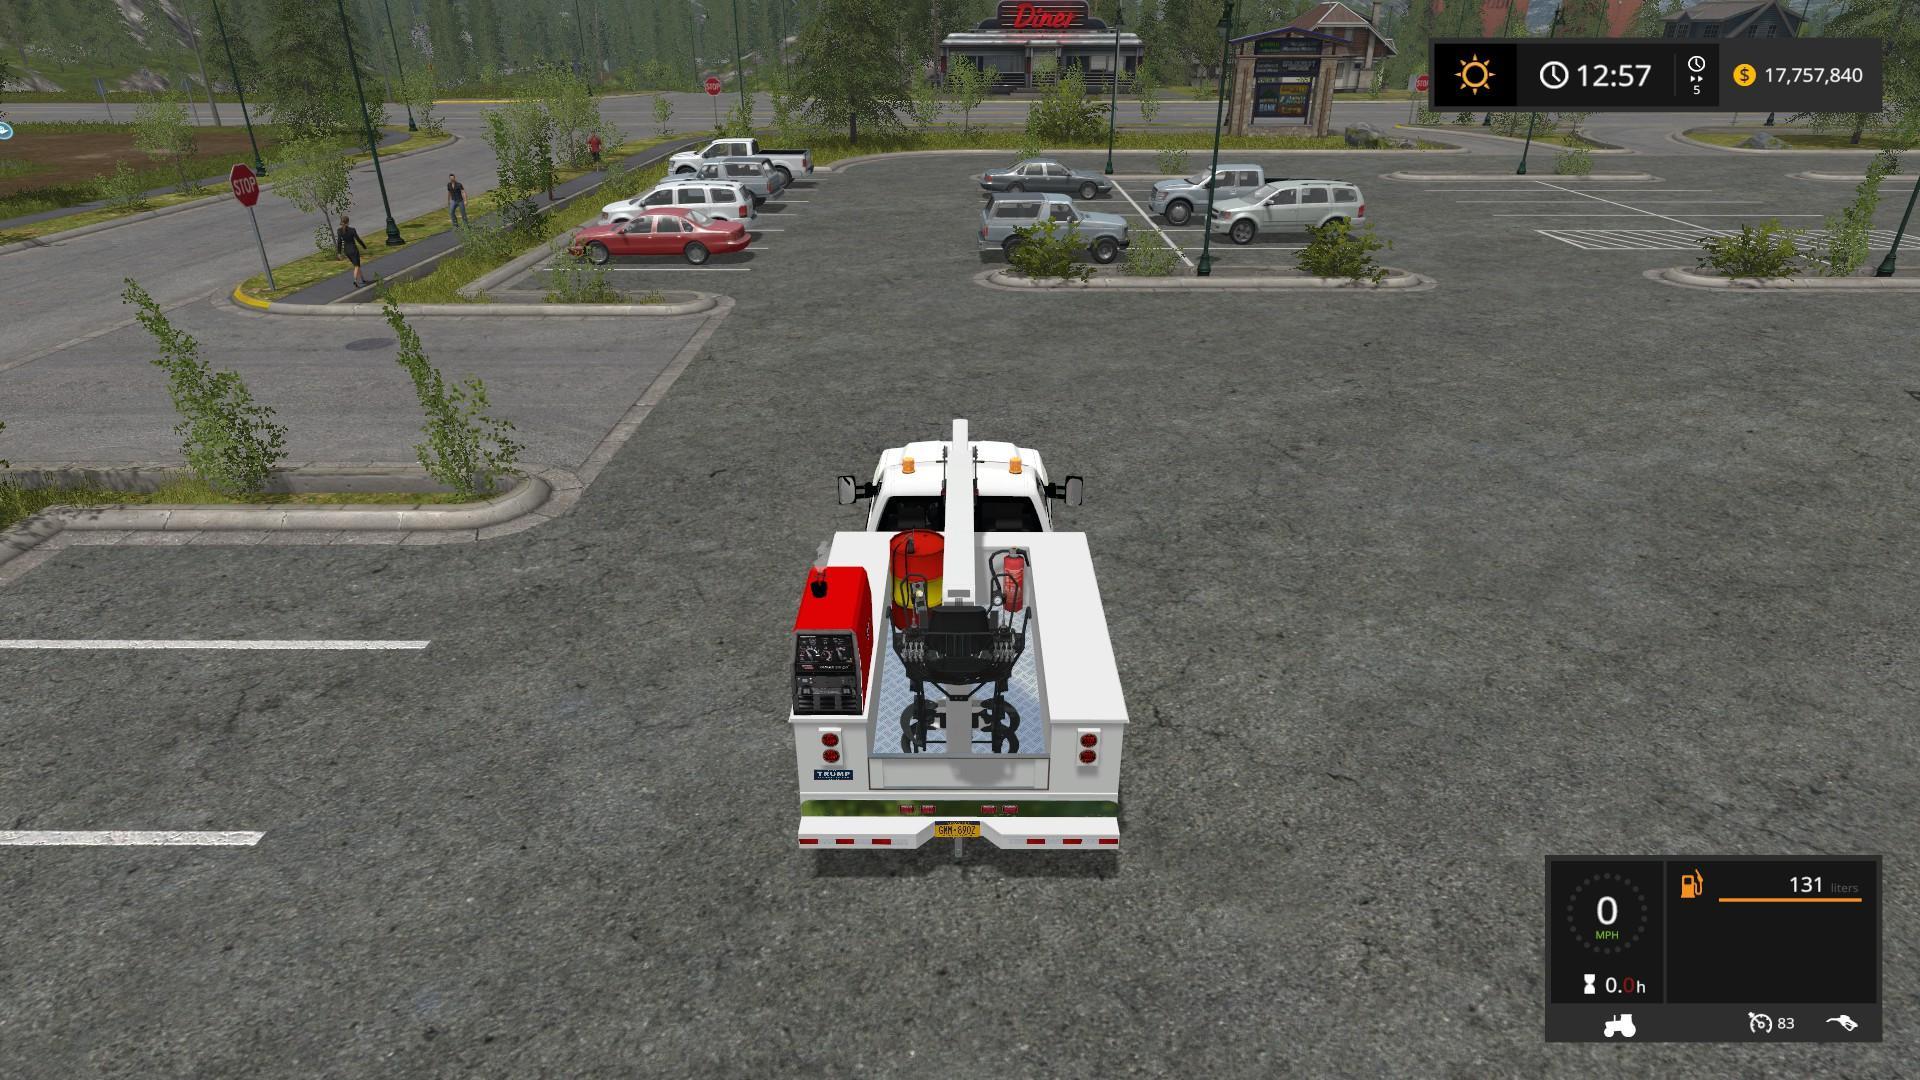 2016 Chevy Silverado 3500hd Service Truck Fs 17 Farming Simulator 17 Mod Fs 2017 Mod